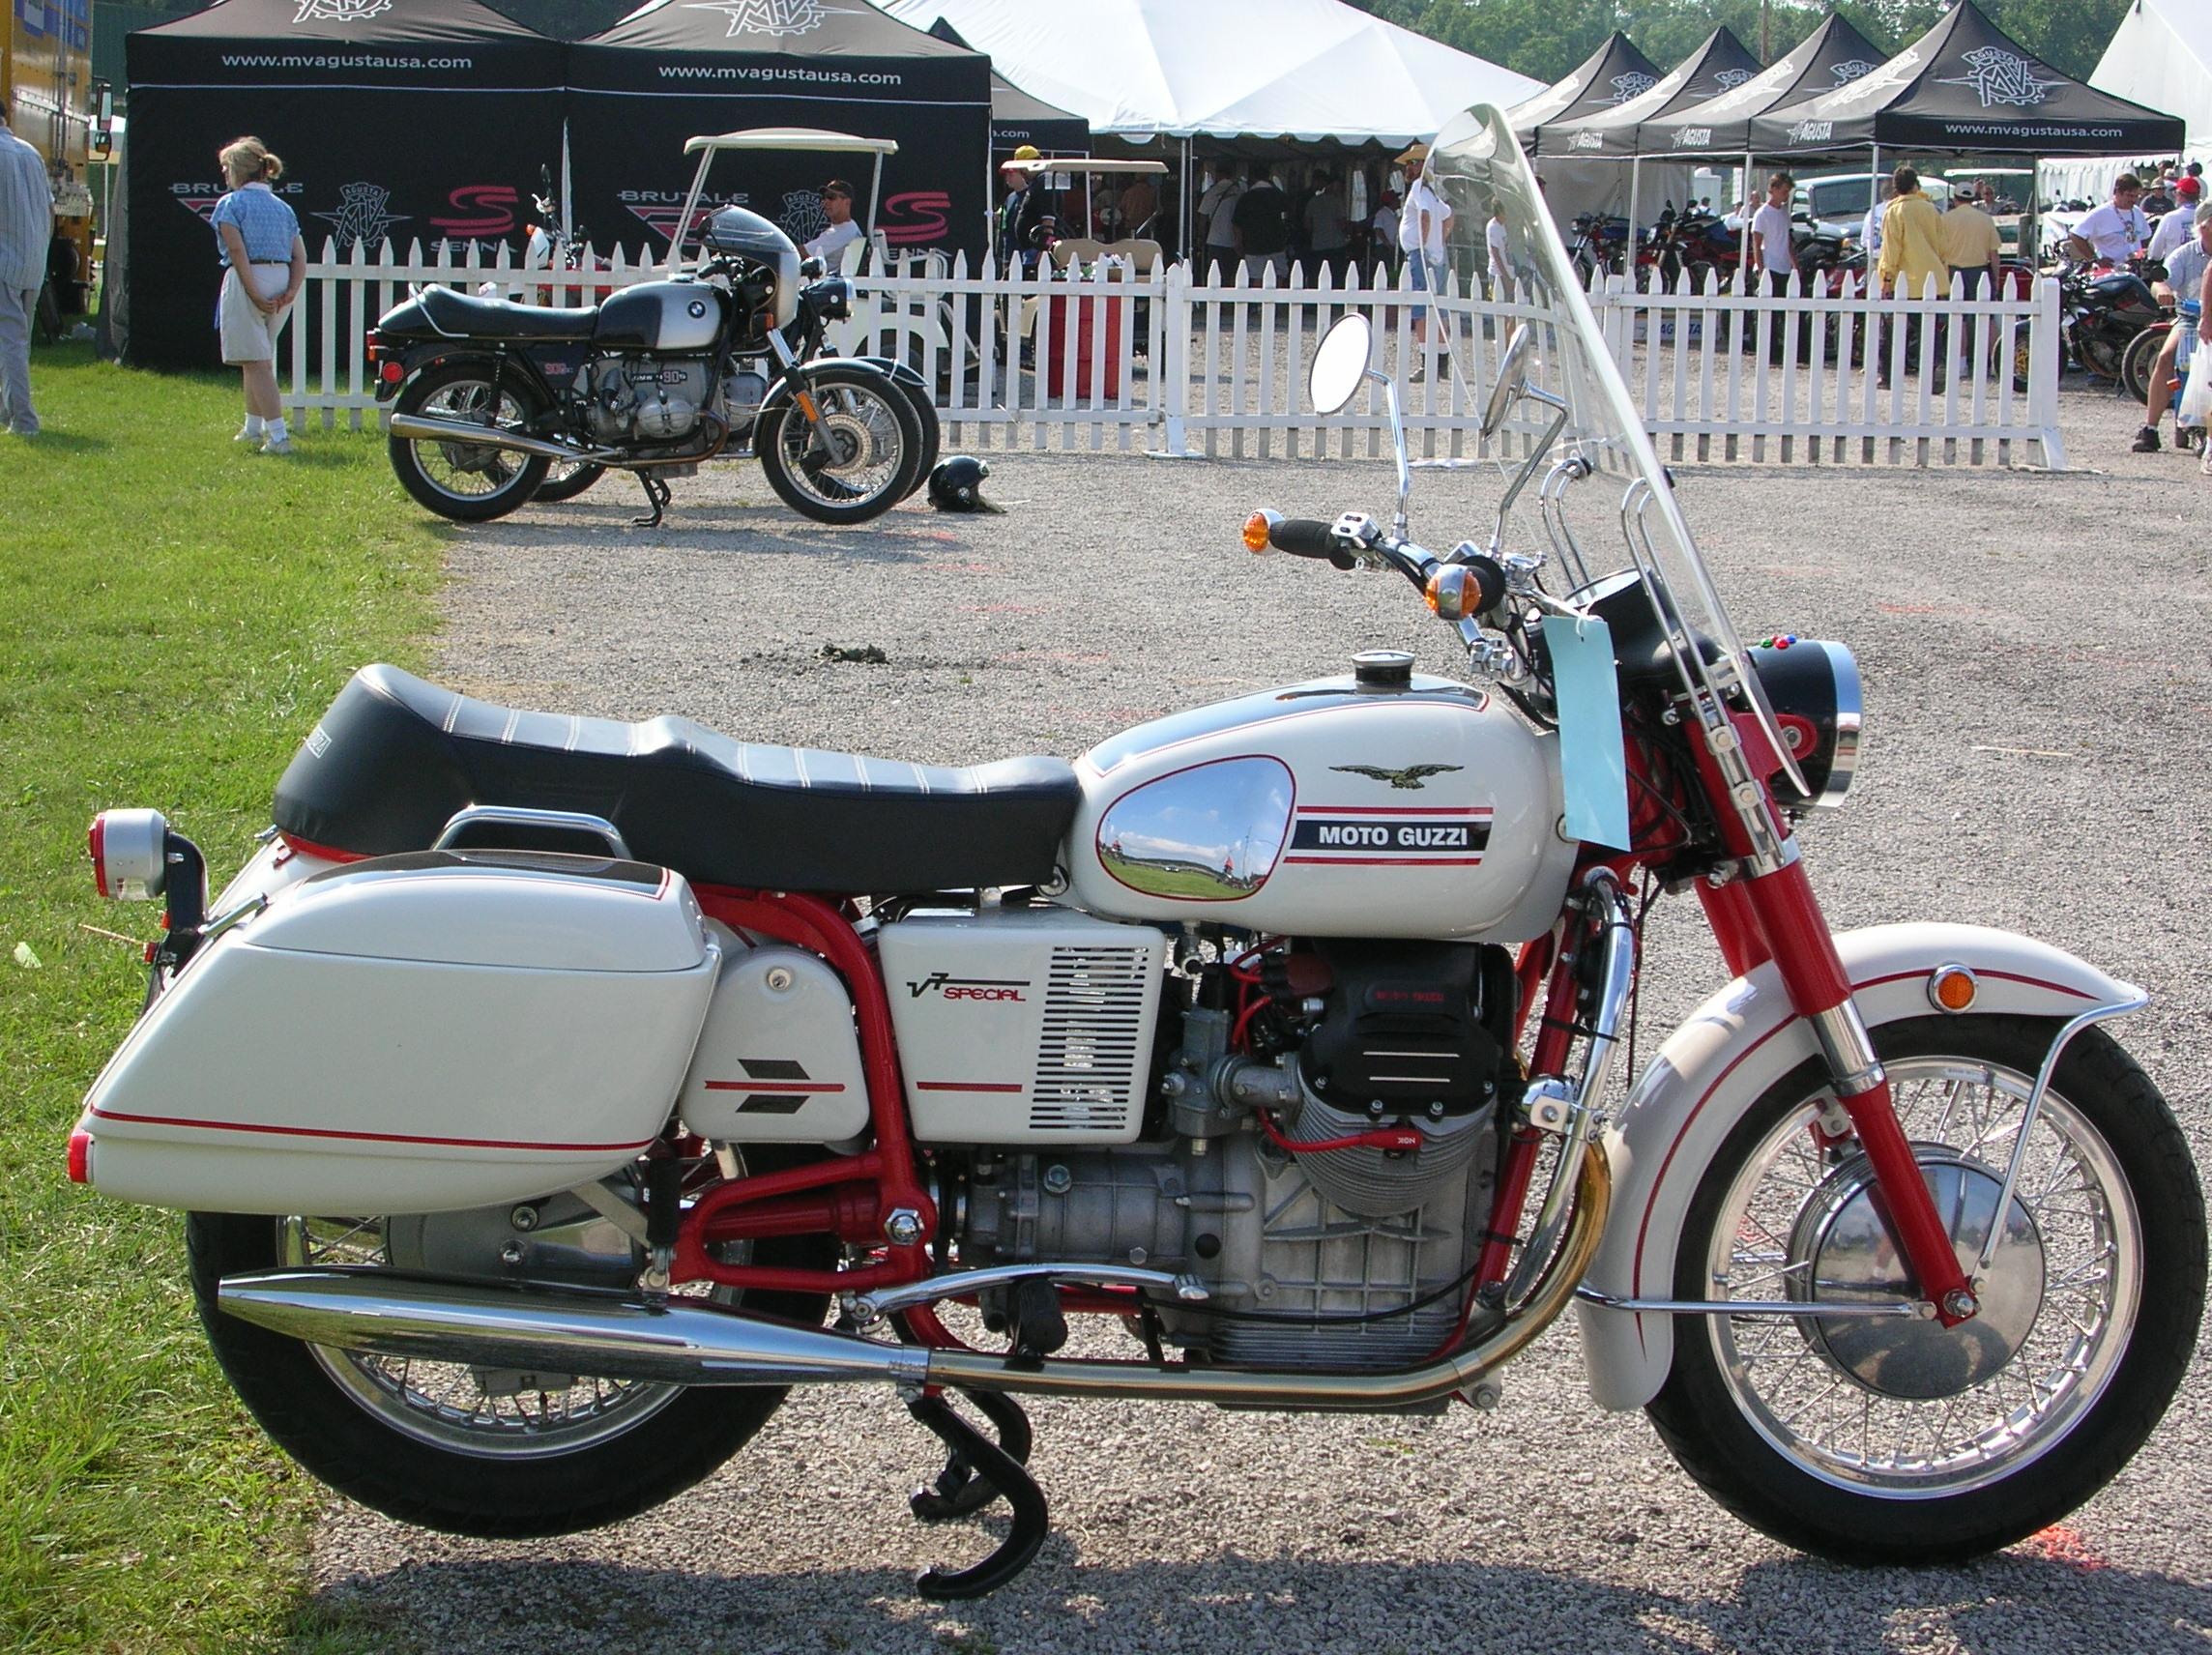 File:Moto Guzzi V7 Special 2.jpg - Wikimedia Commons